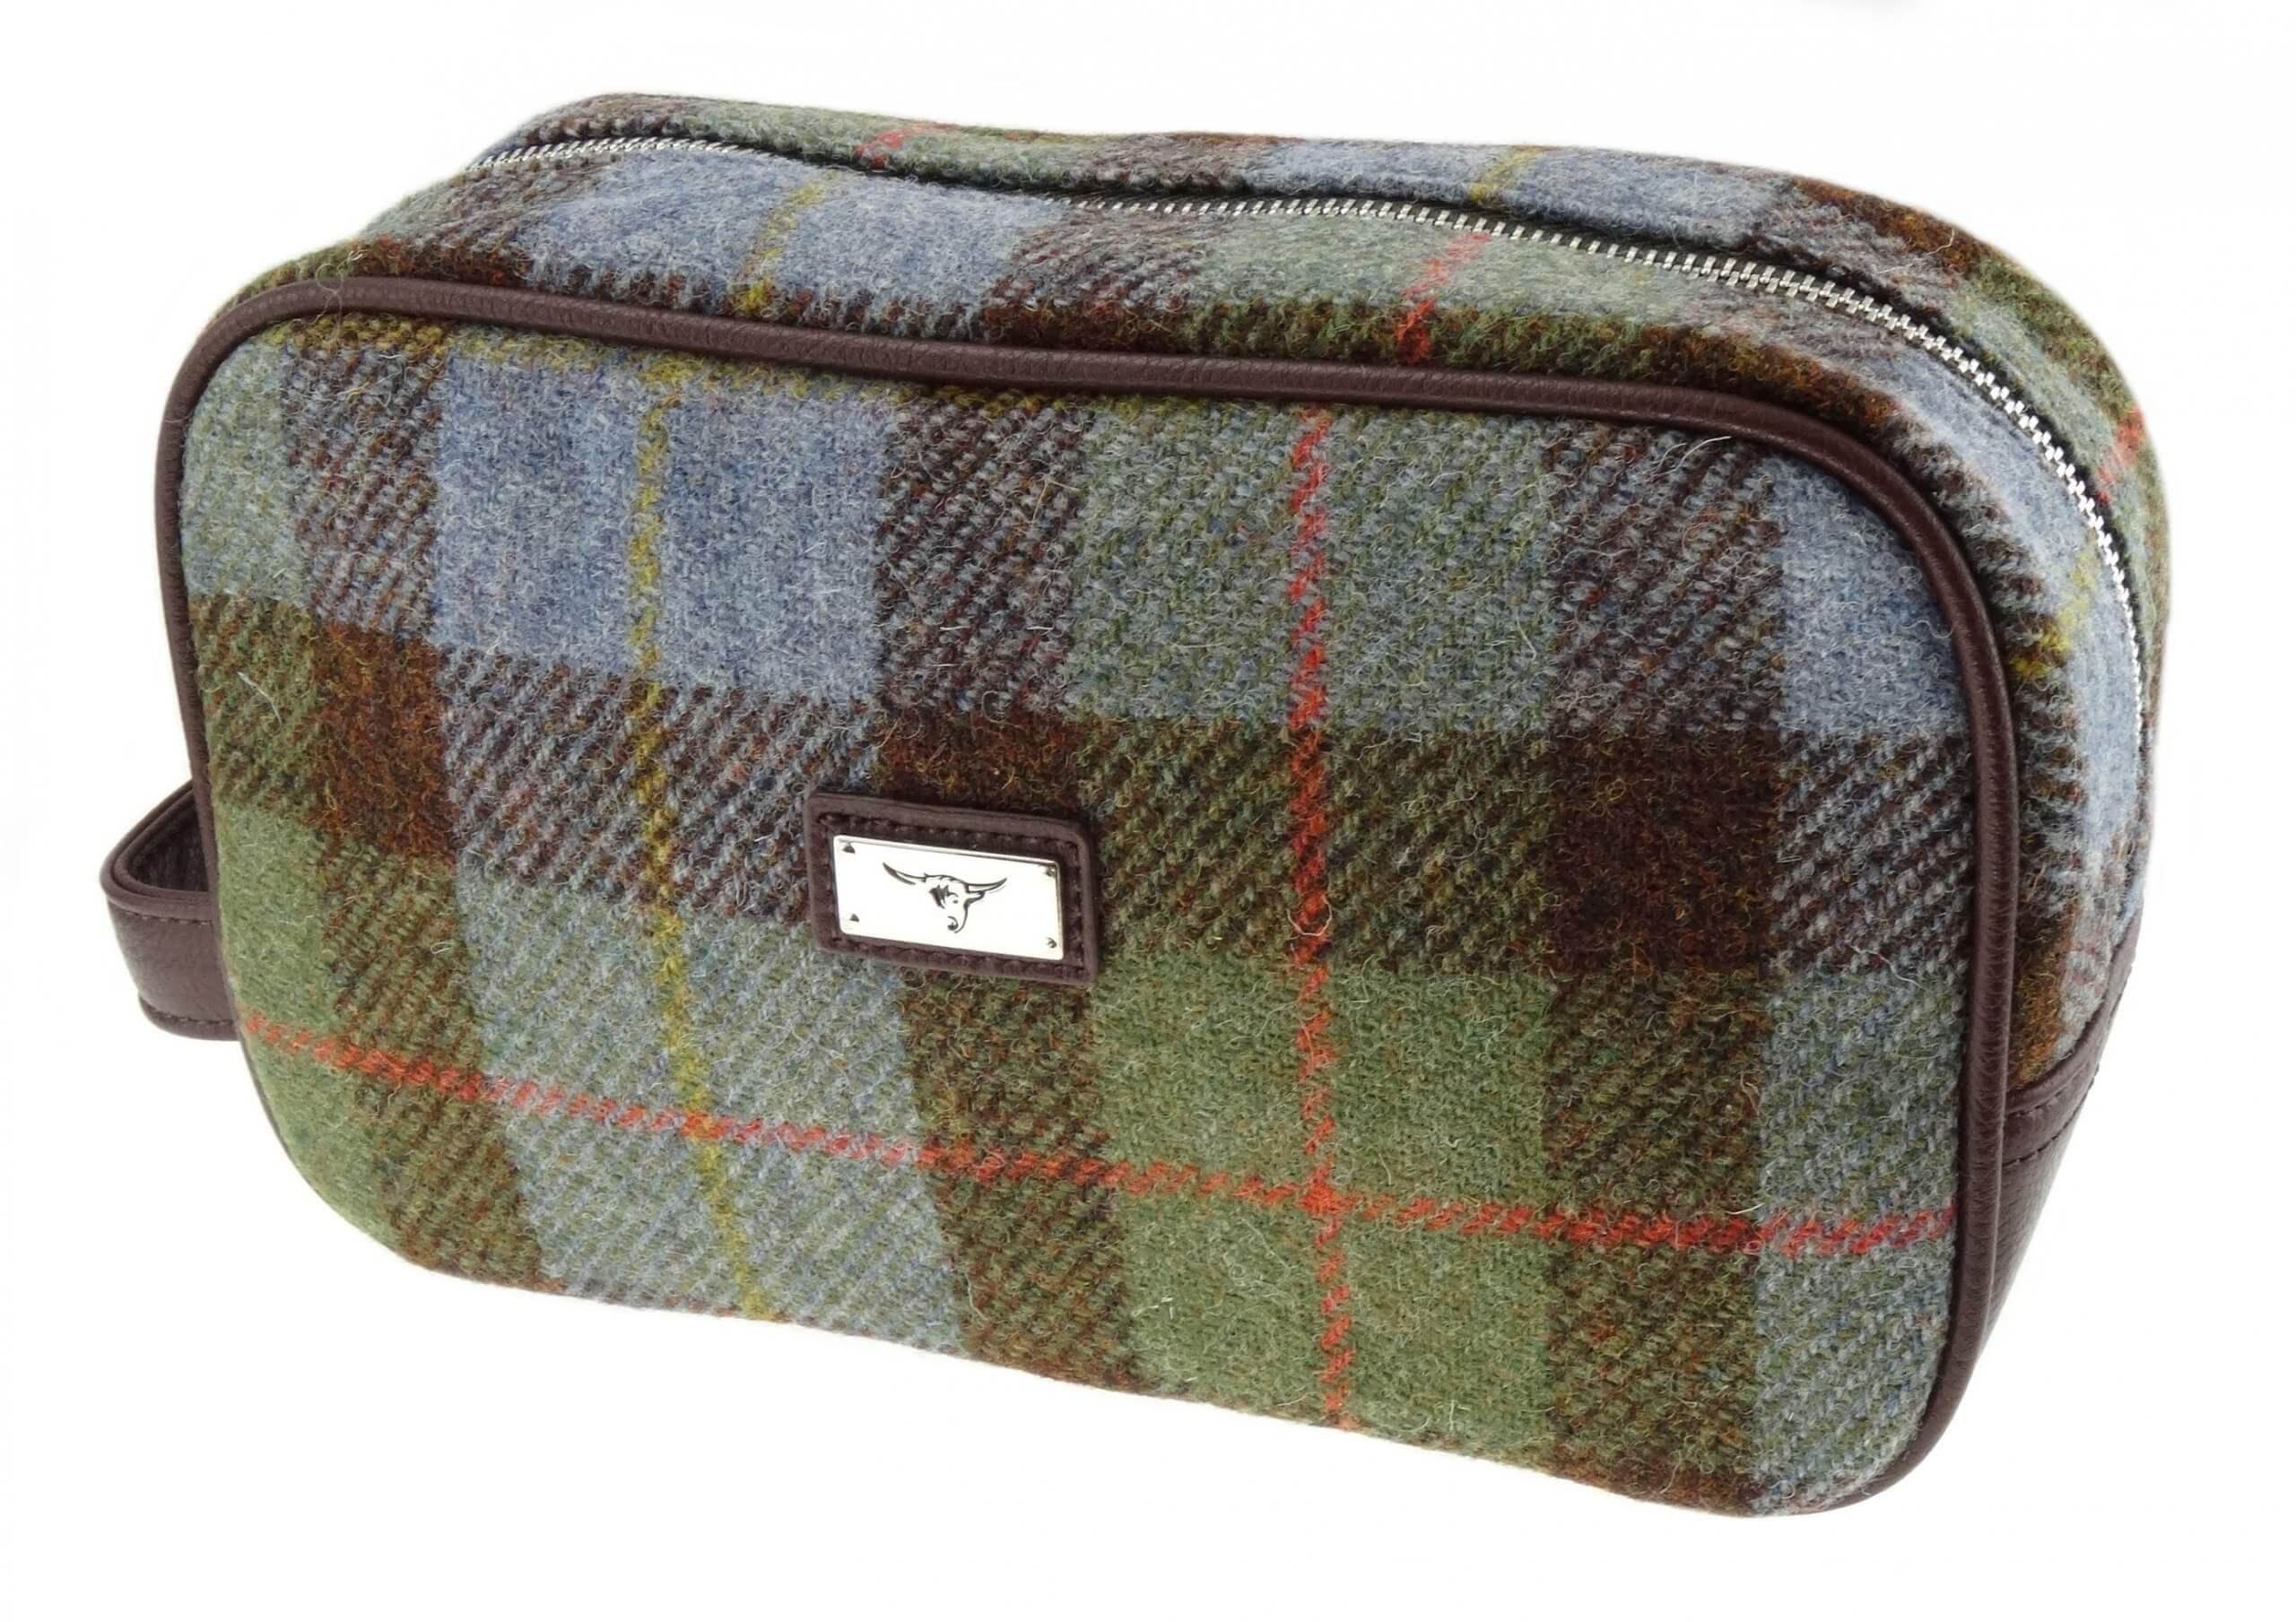 Harris Tweed Wash Bag LB2102-COL15